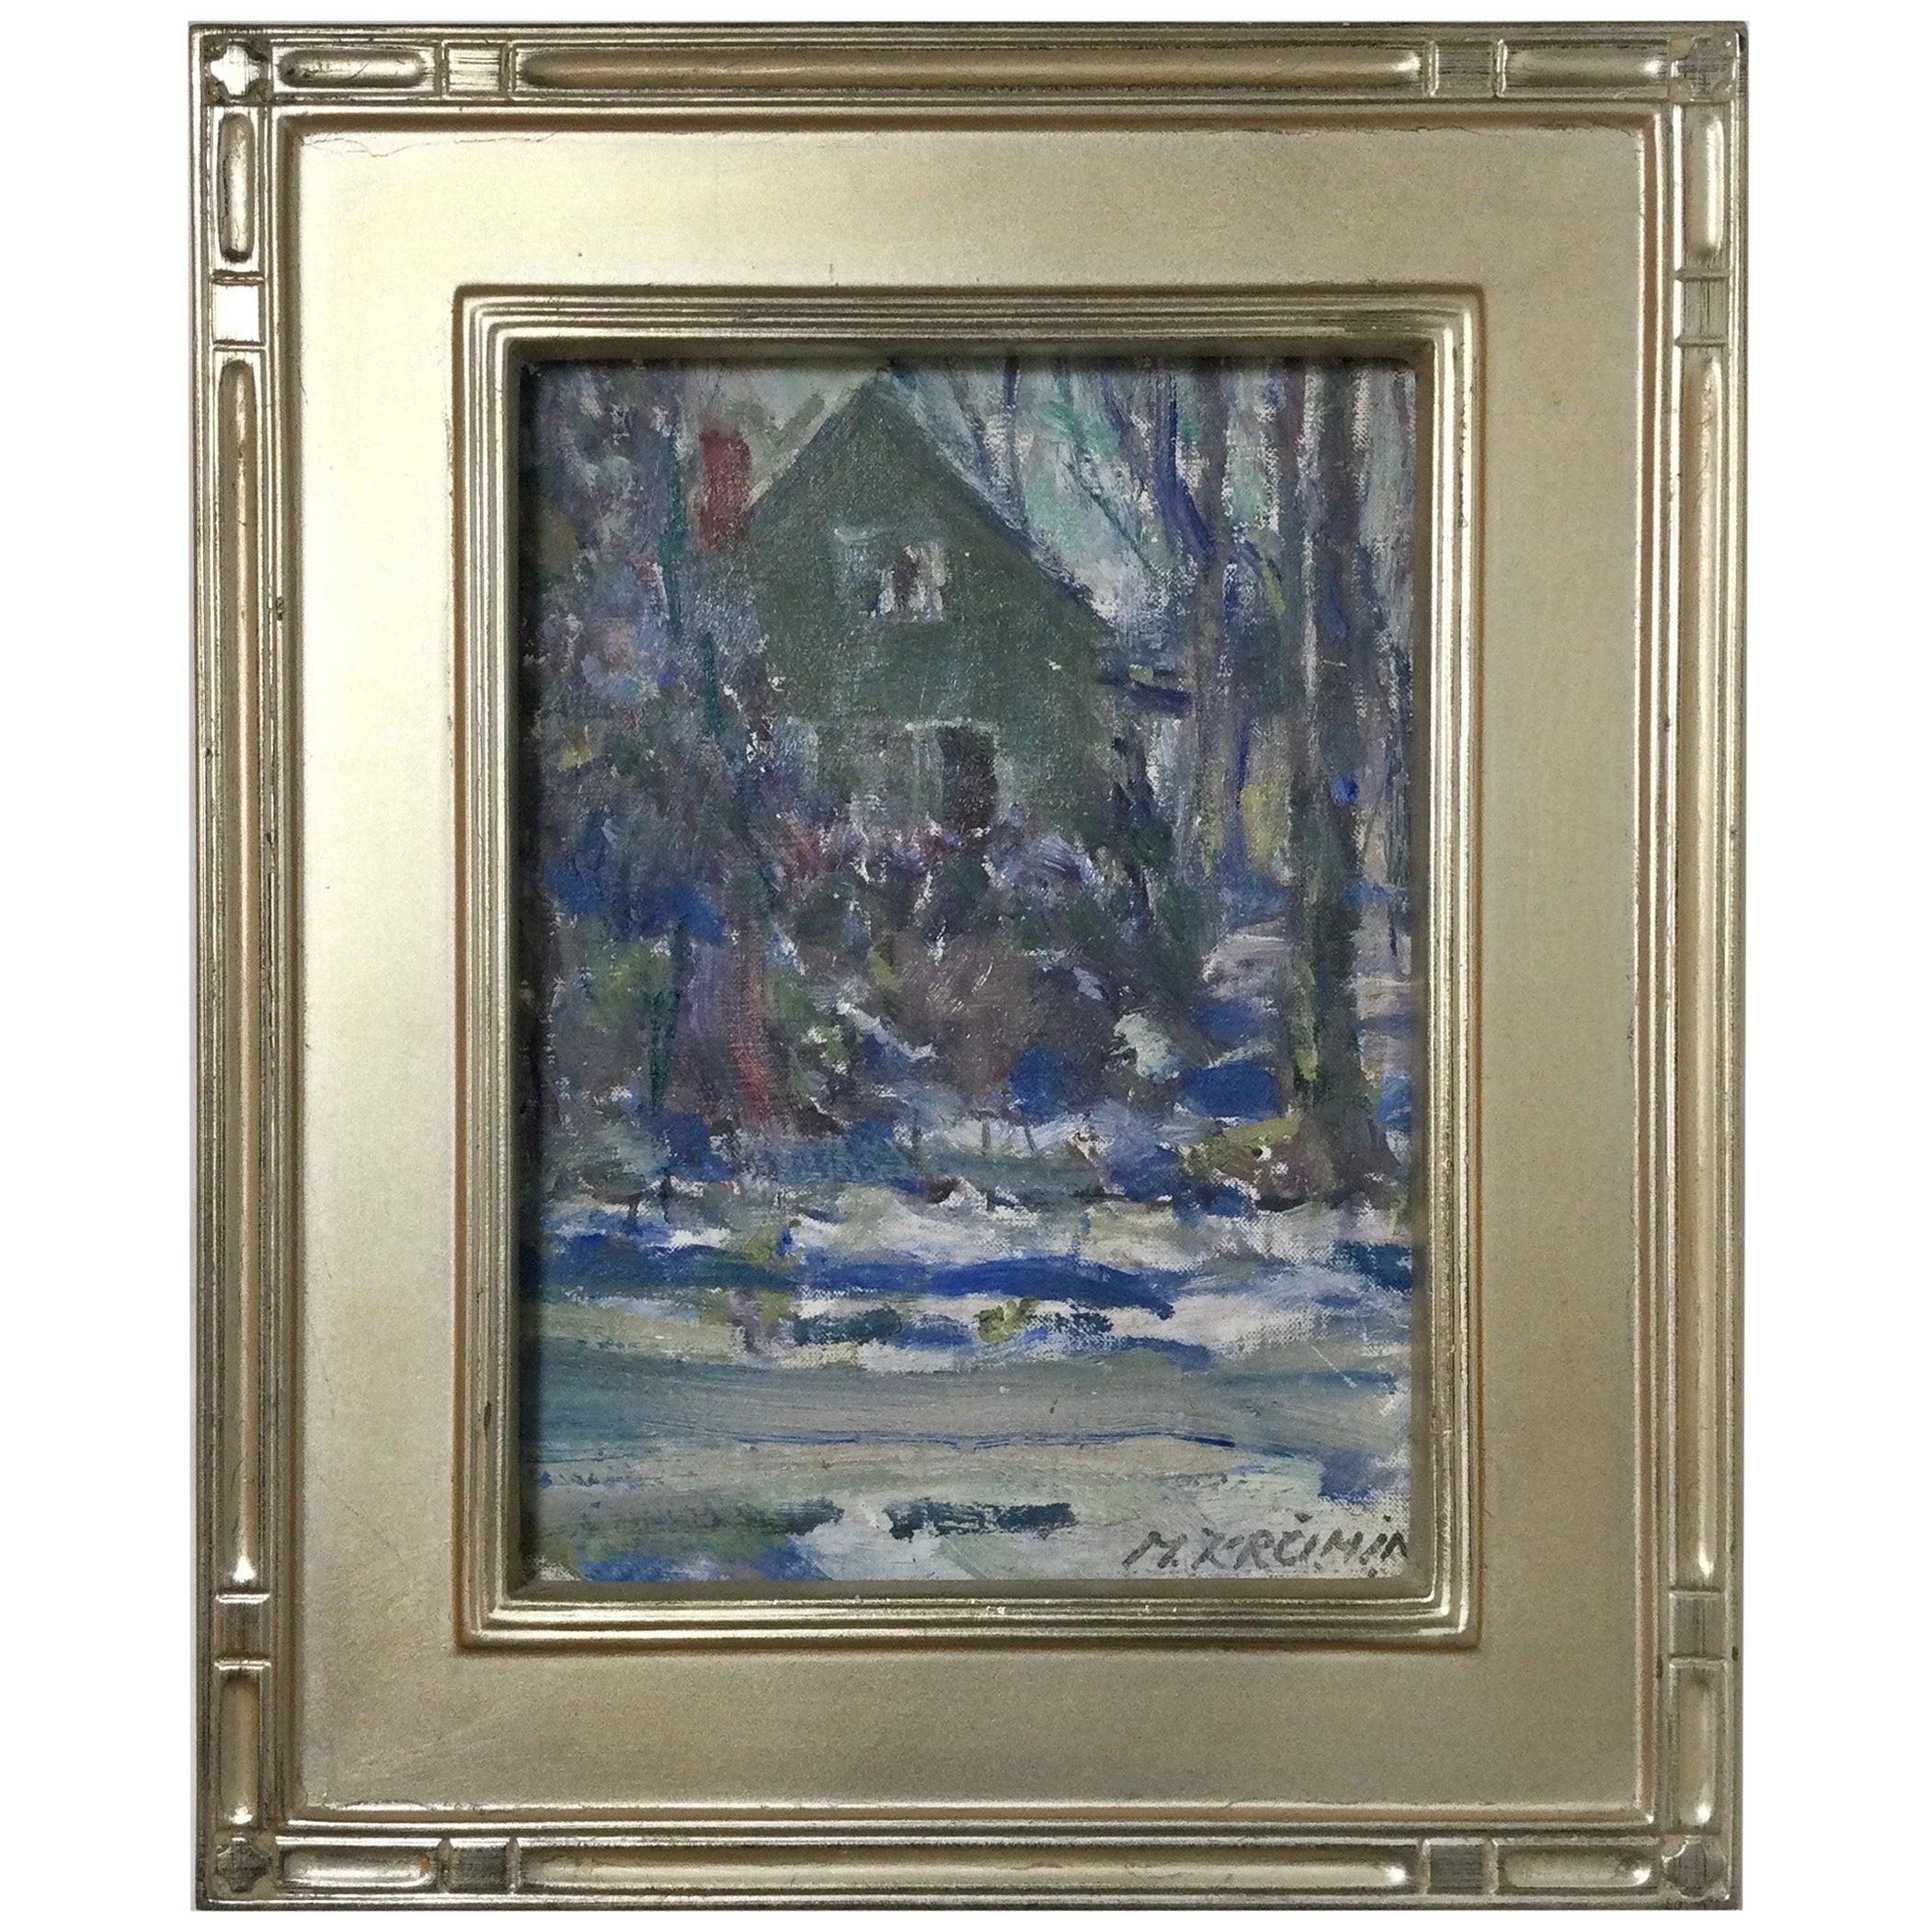 Impressionist Winter Scene Artist Martins Krumins, 1953